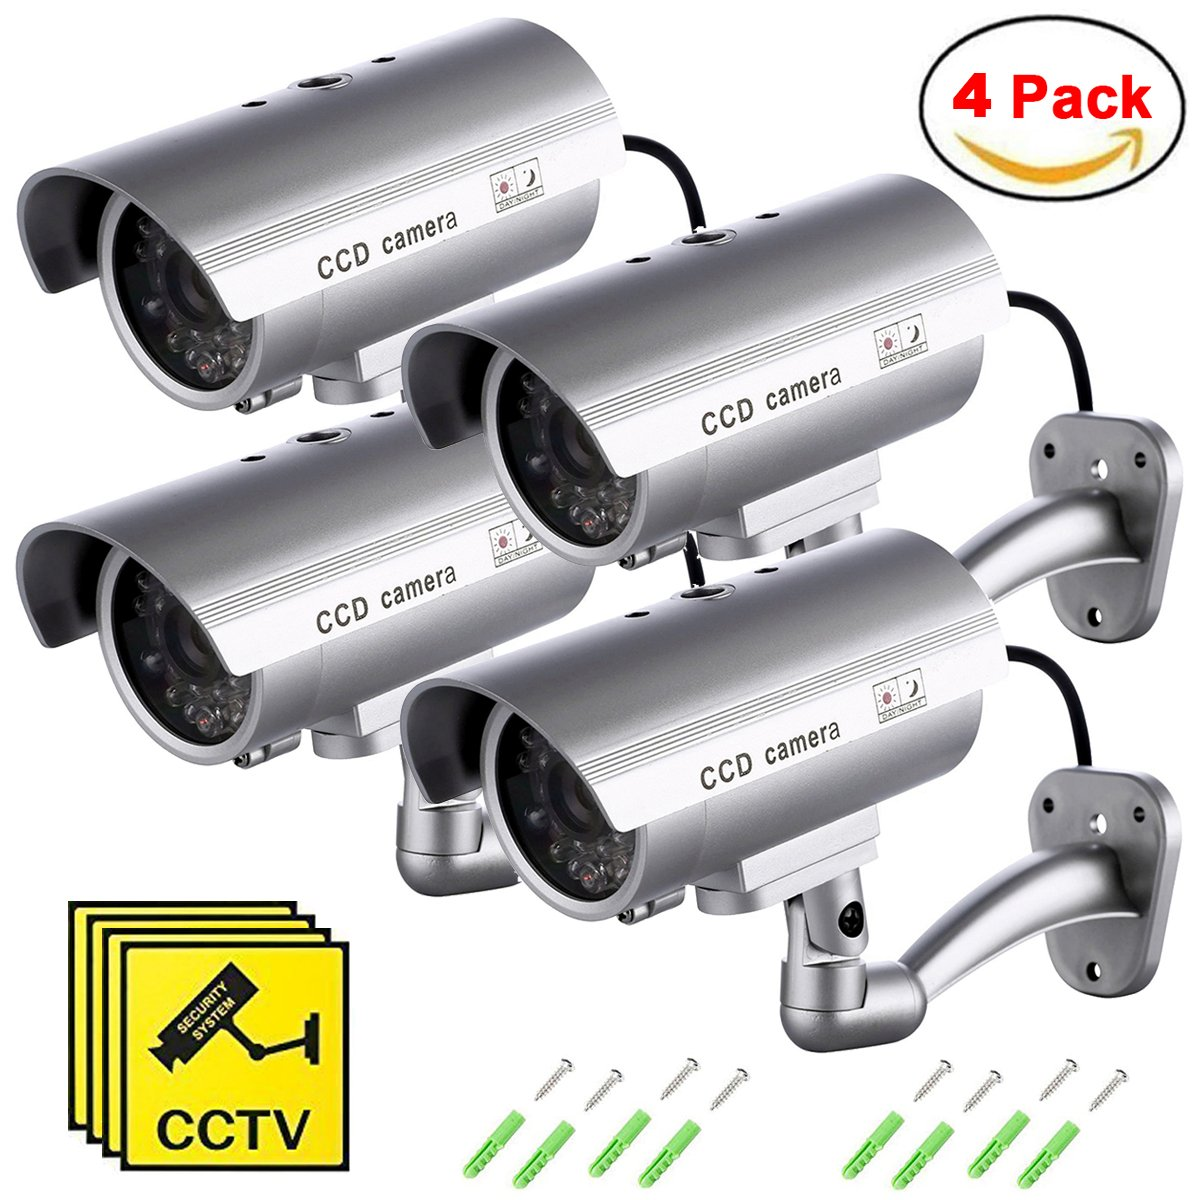 Maxesla Cámara Falsa, 4 Pieza Dummy Cámara de Seguridad Vigilancia Falsa Inalámbrico Impermeable Sistema de Vigilancia IR LED Parpadeante Fake Cámara Simulada CCTV